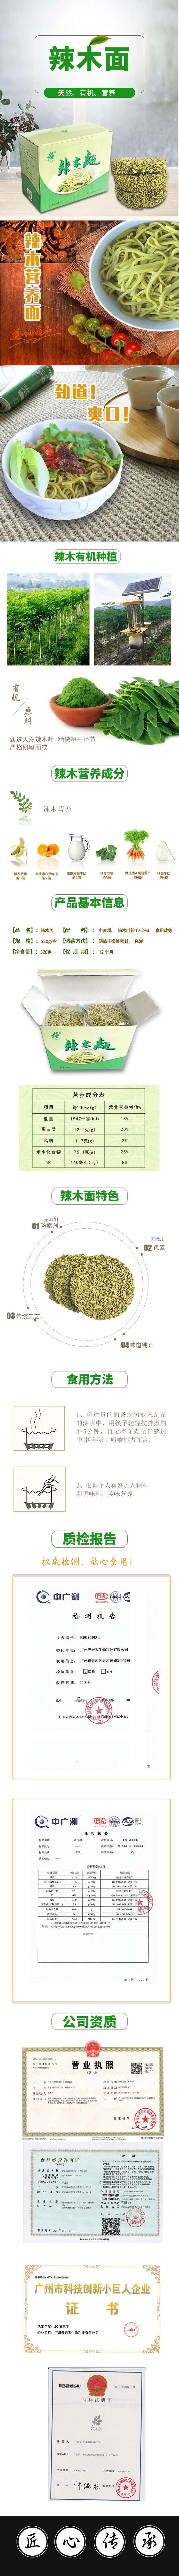 http://b2bwings-goods-image.oss-cn-shenzhen.aliyuncs.com/ad1990d9-e512-4327-86ab-5c11be244d6b.jpg